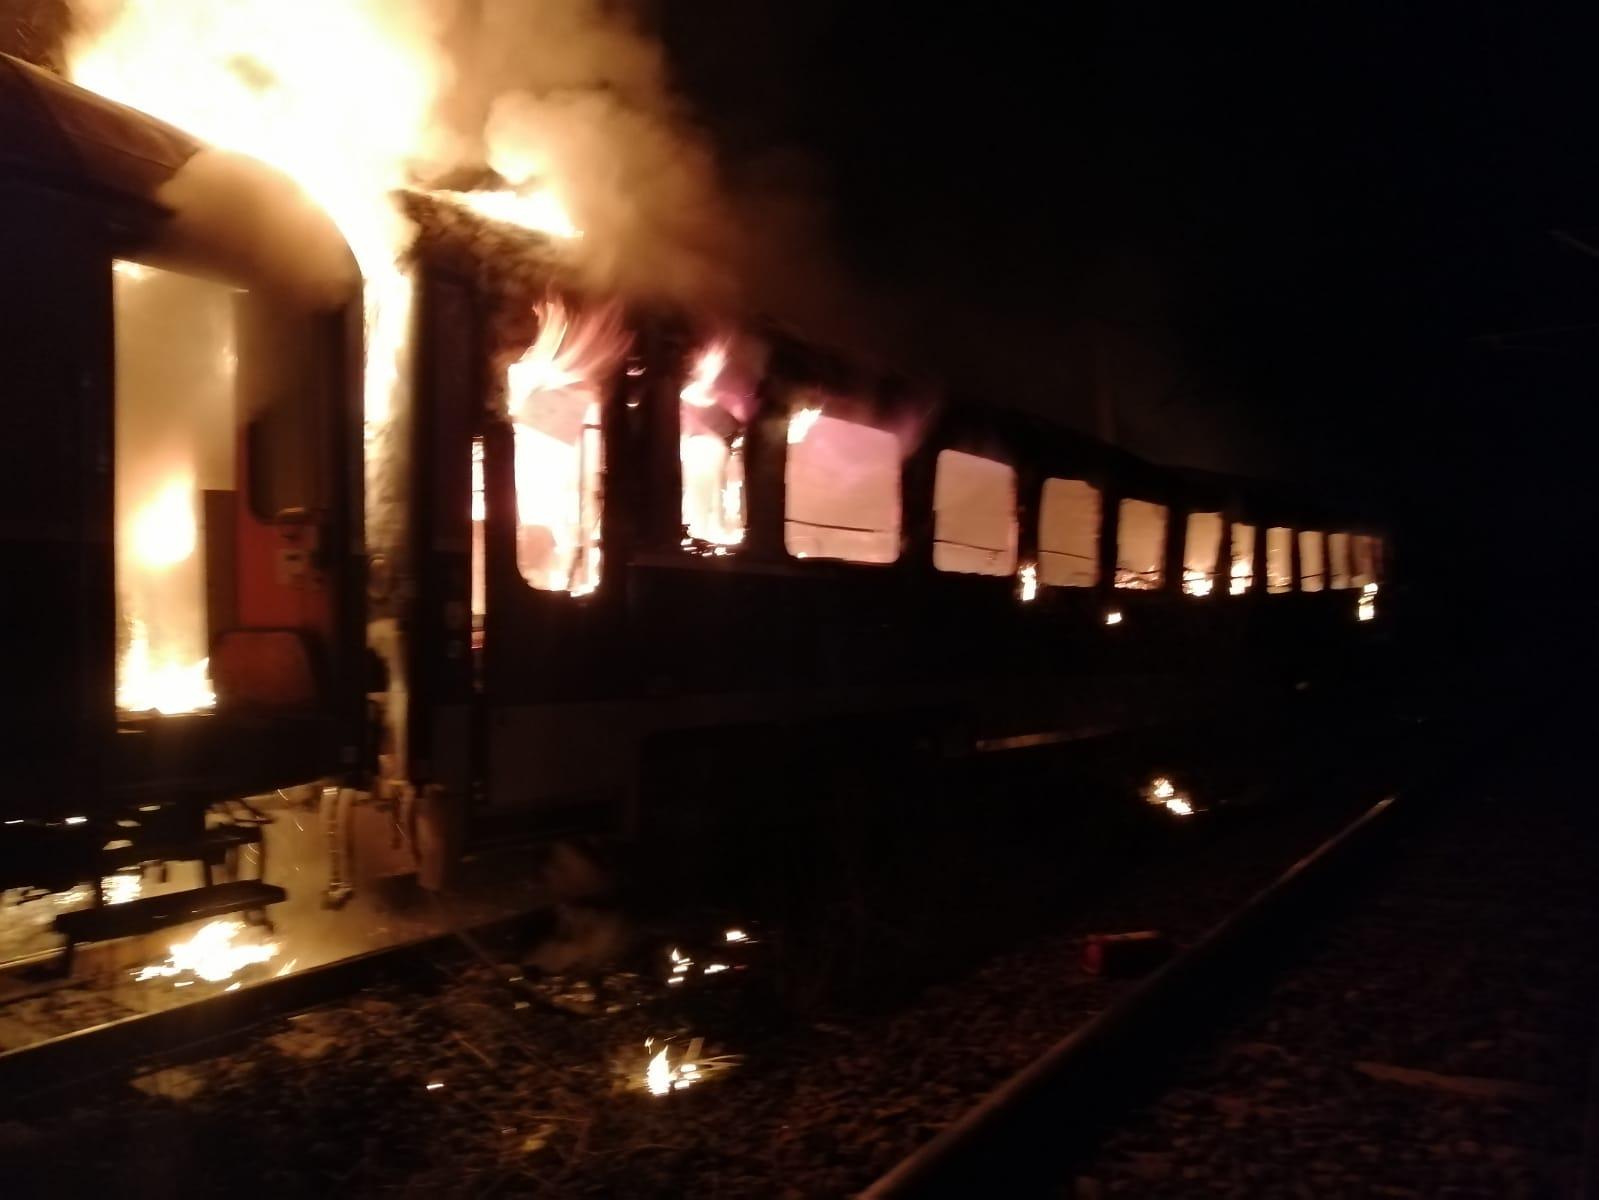 Cadavrul carbonizat al unei persoane, găsit într-un vagon de tren care a luat foc. FOTO